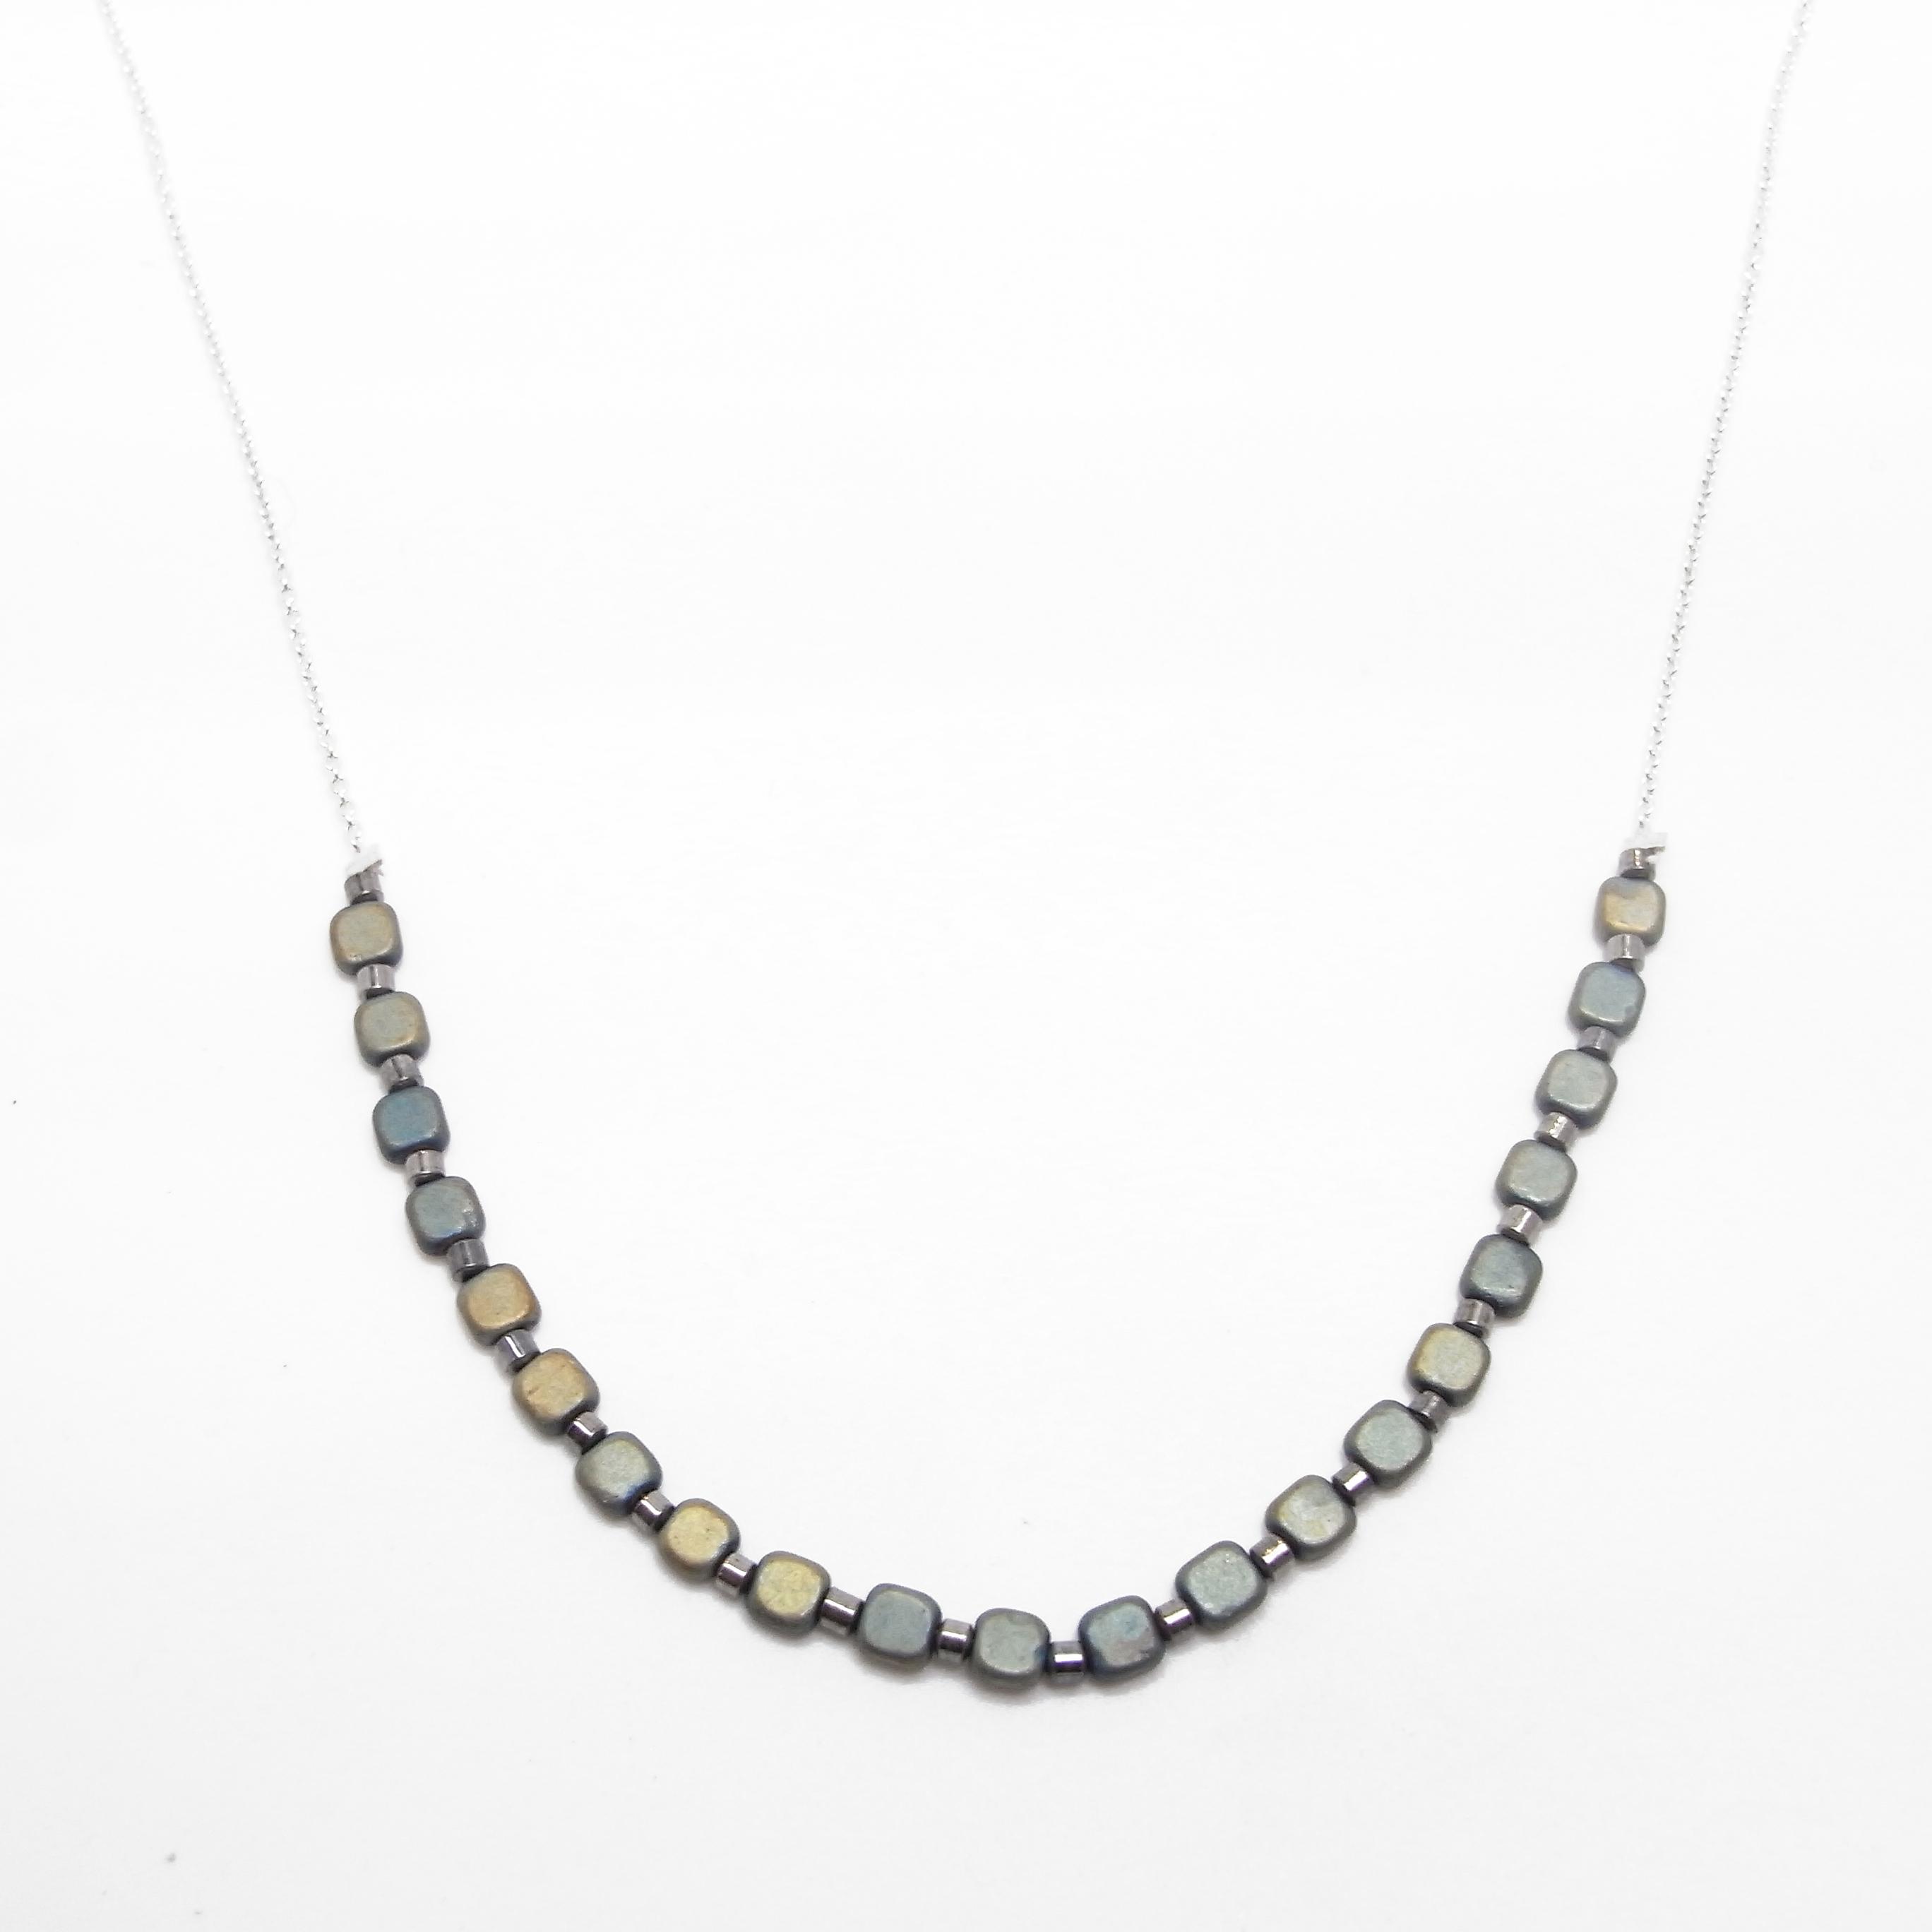 SALE - Hematite Necklace